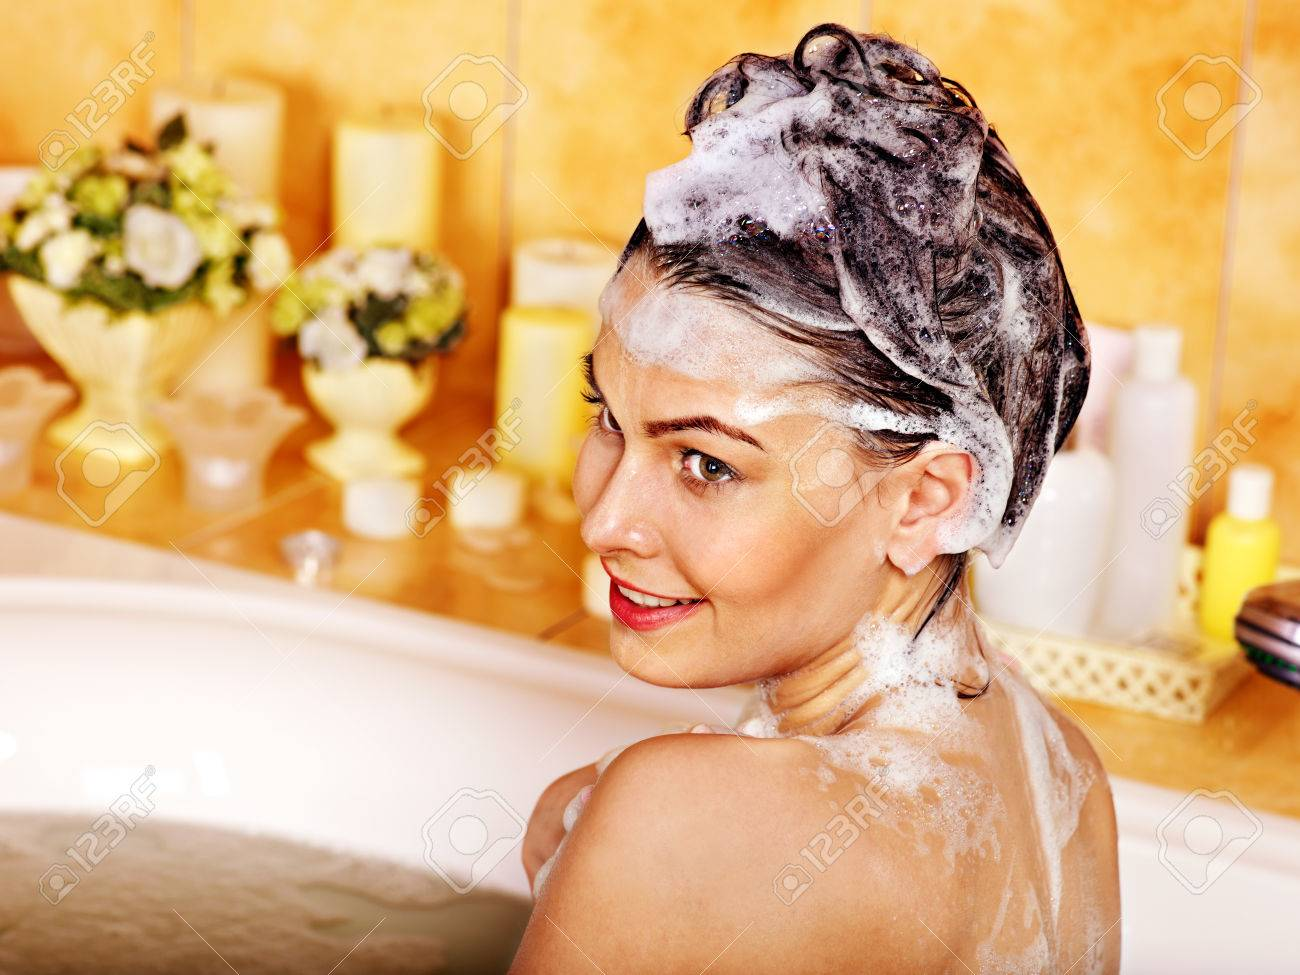 Woman washing hair in bubble bath. - 22673276